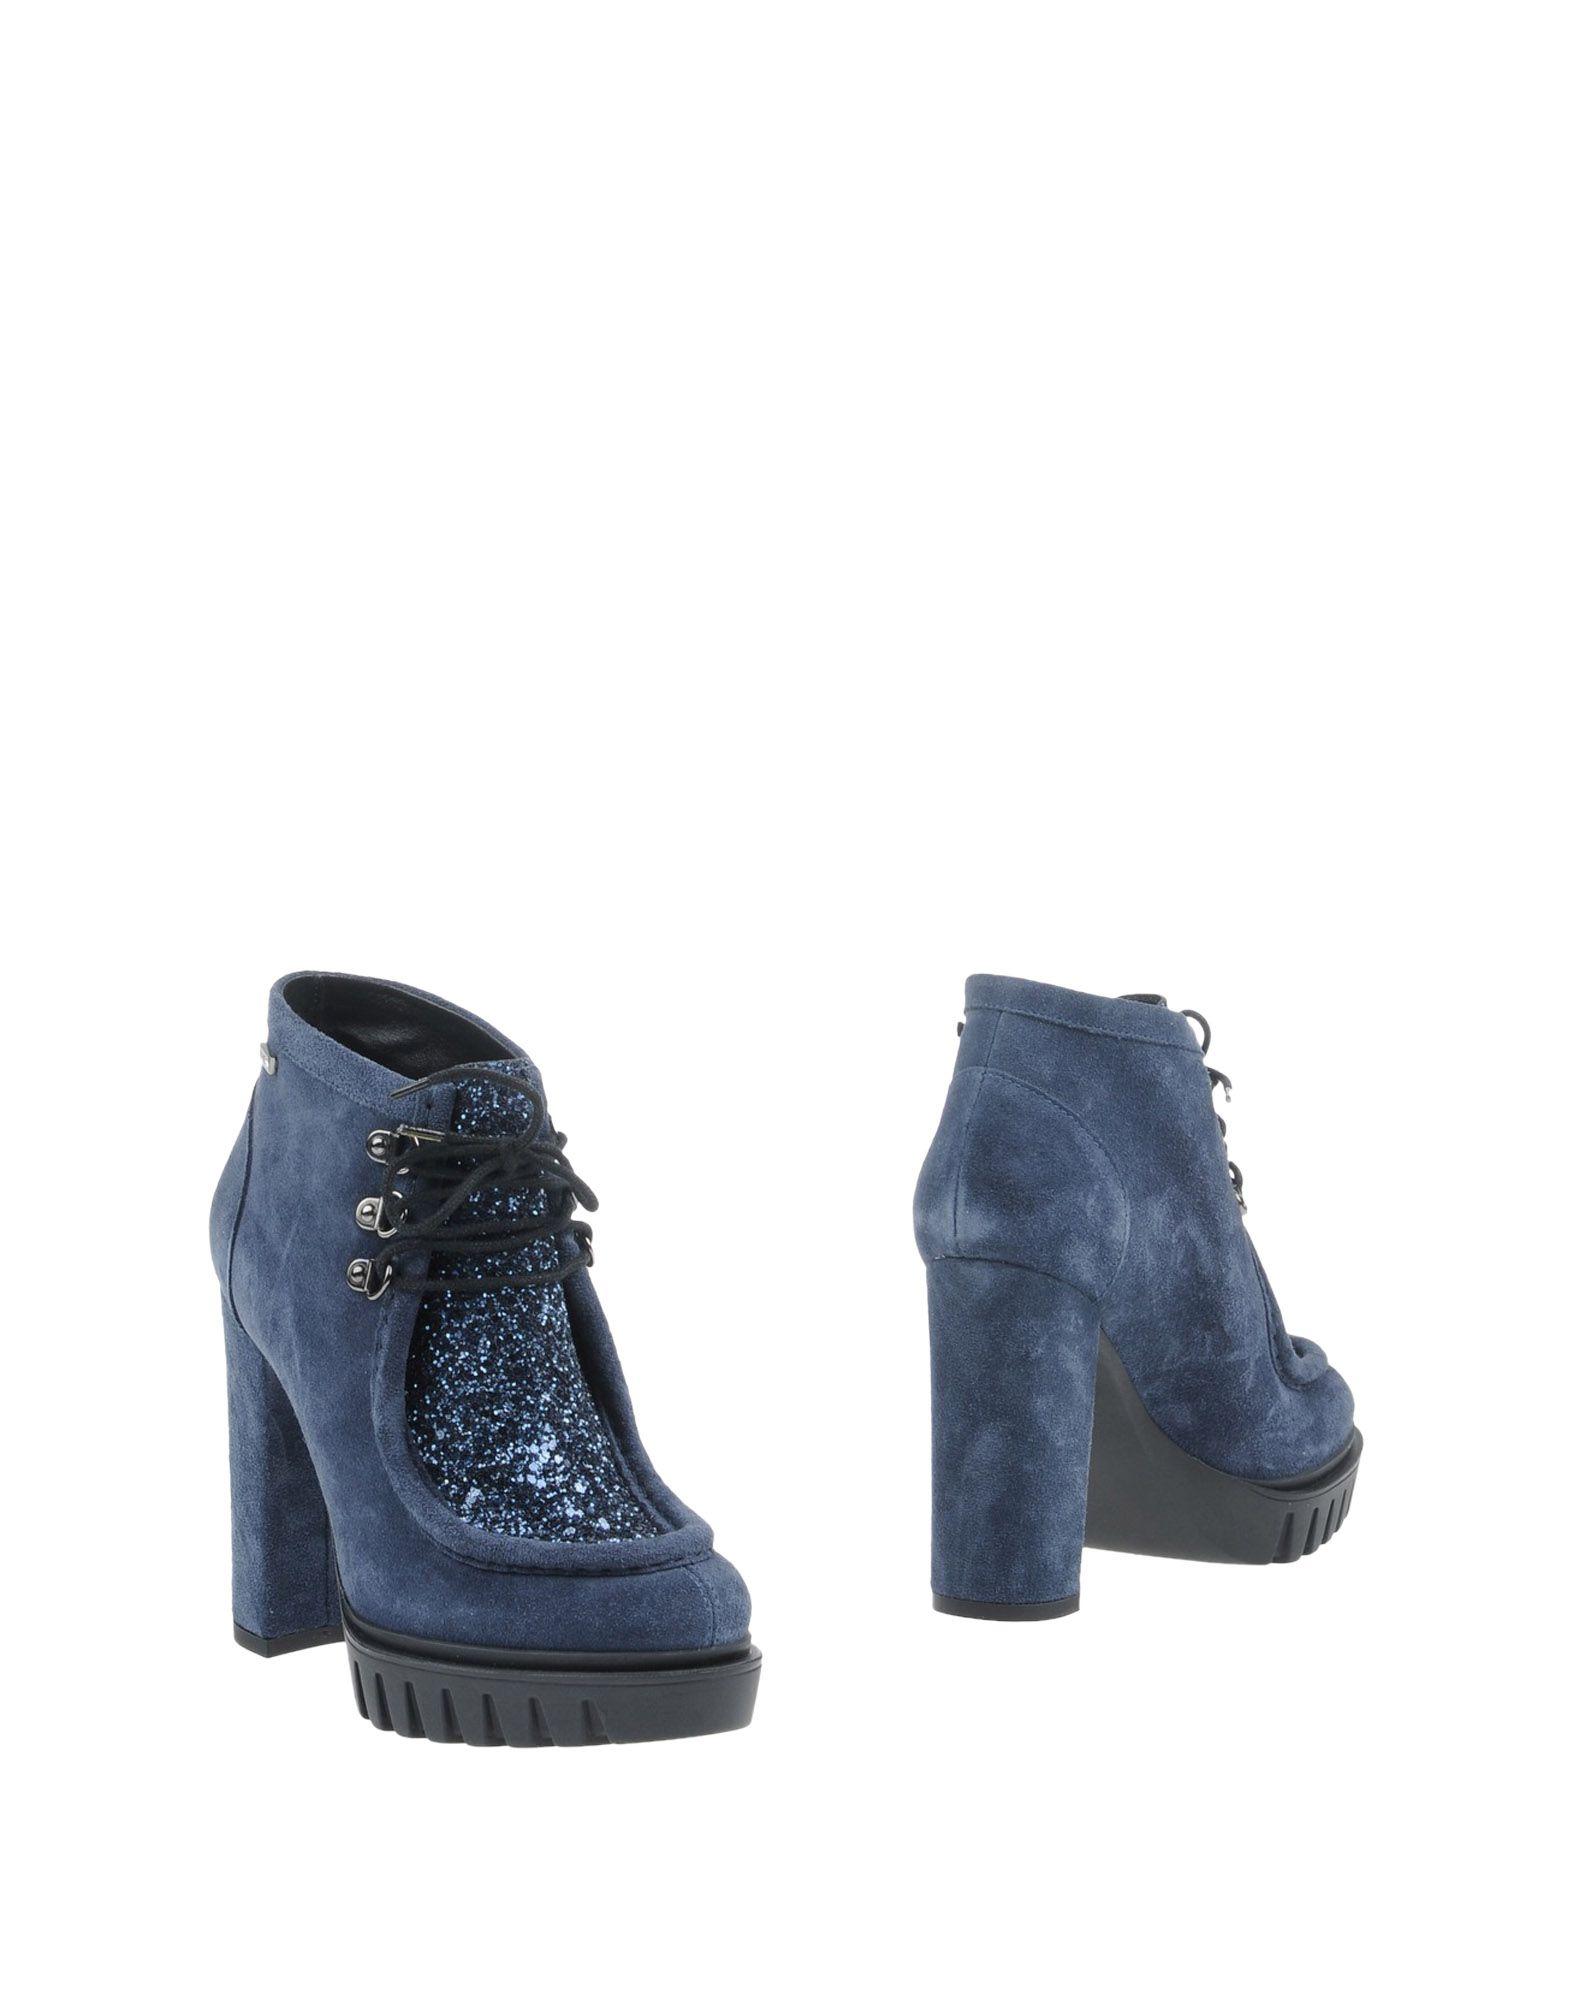 Liu •Jo Shoes Stiefelette Damen  11233942CW Gute Qualität beliebte Schuhe